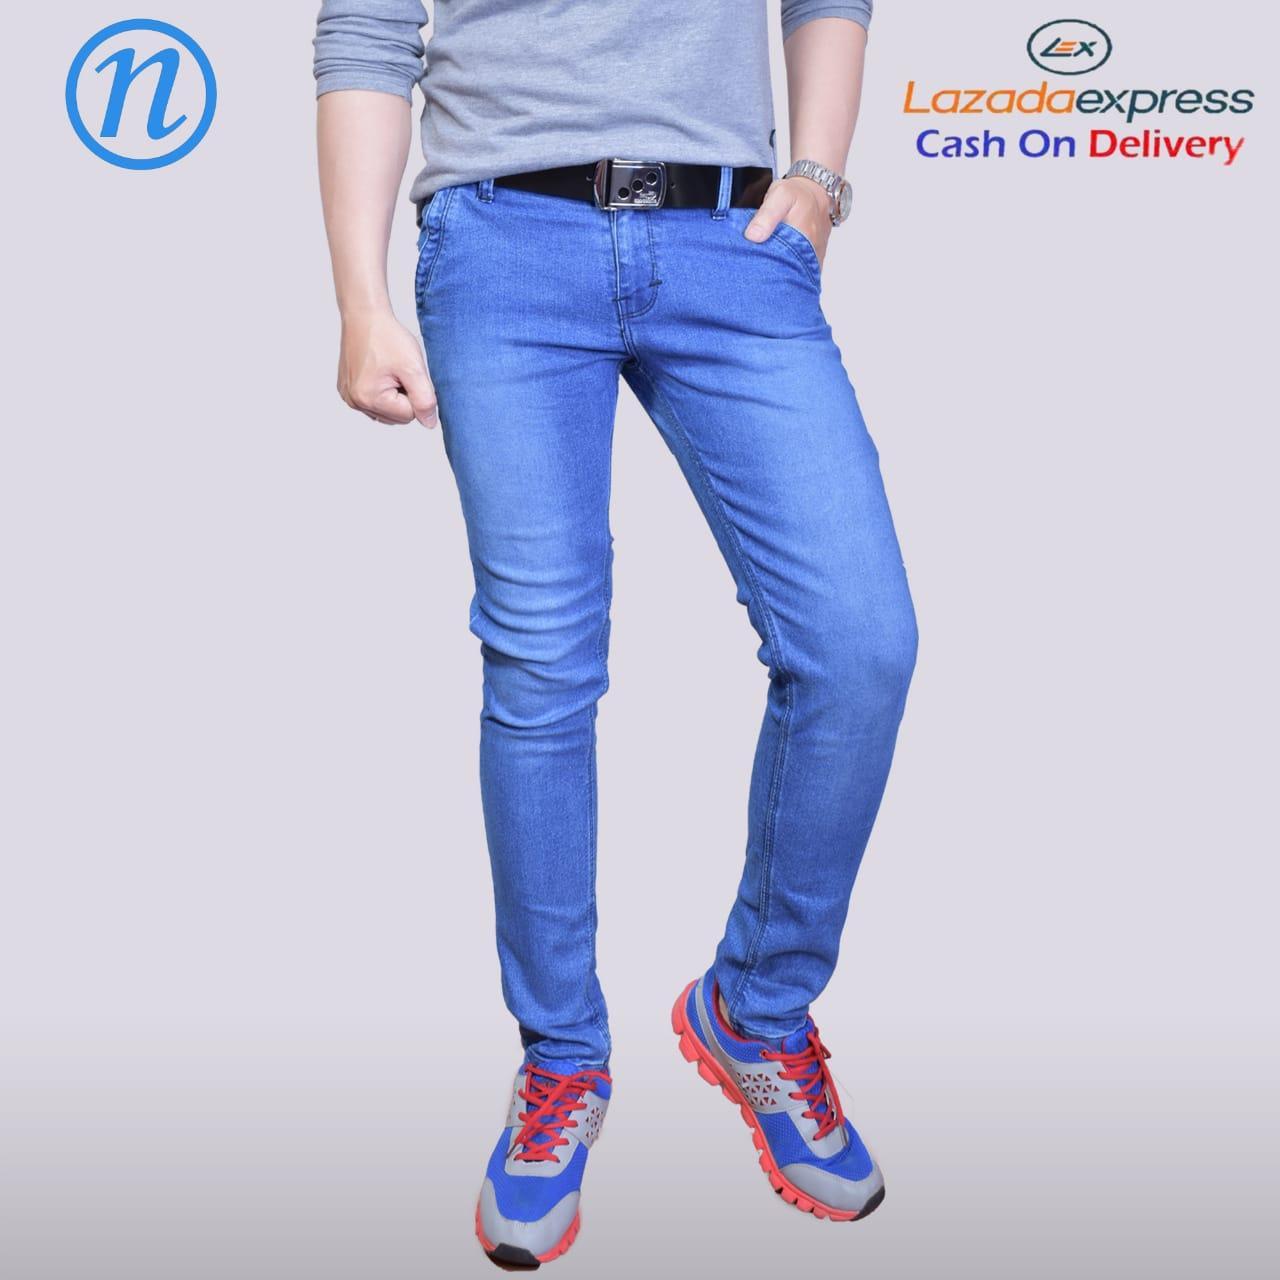 100+  Celana Jeans Biru Pria Terbaru Gratis